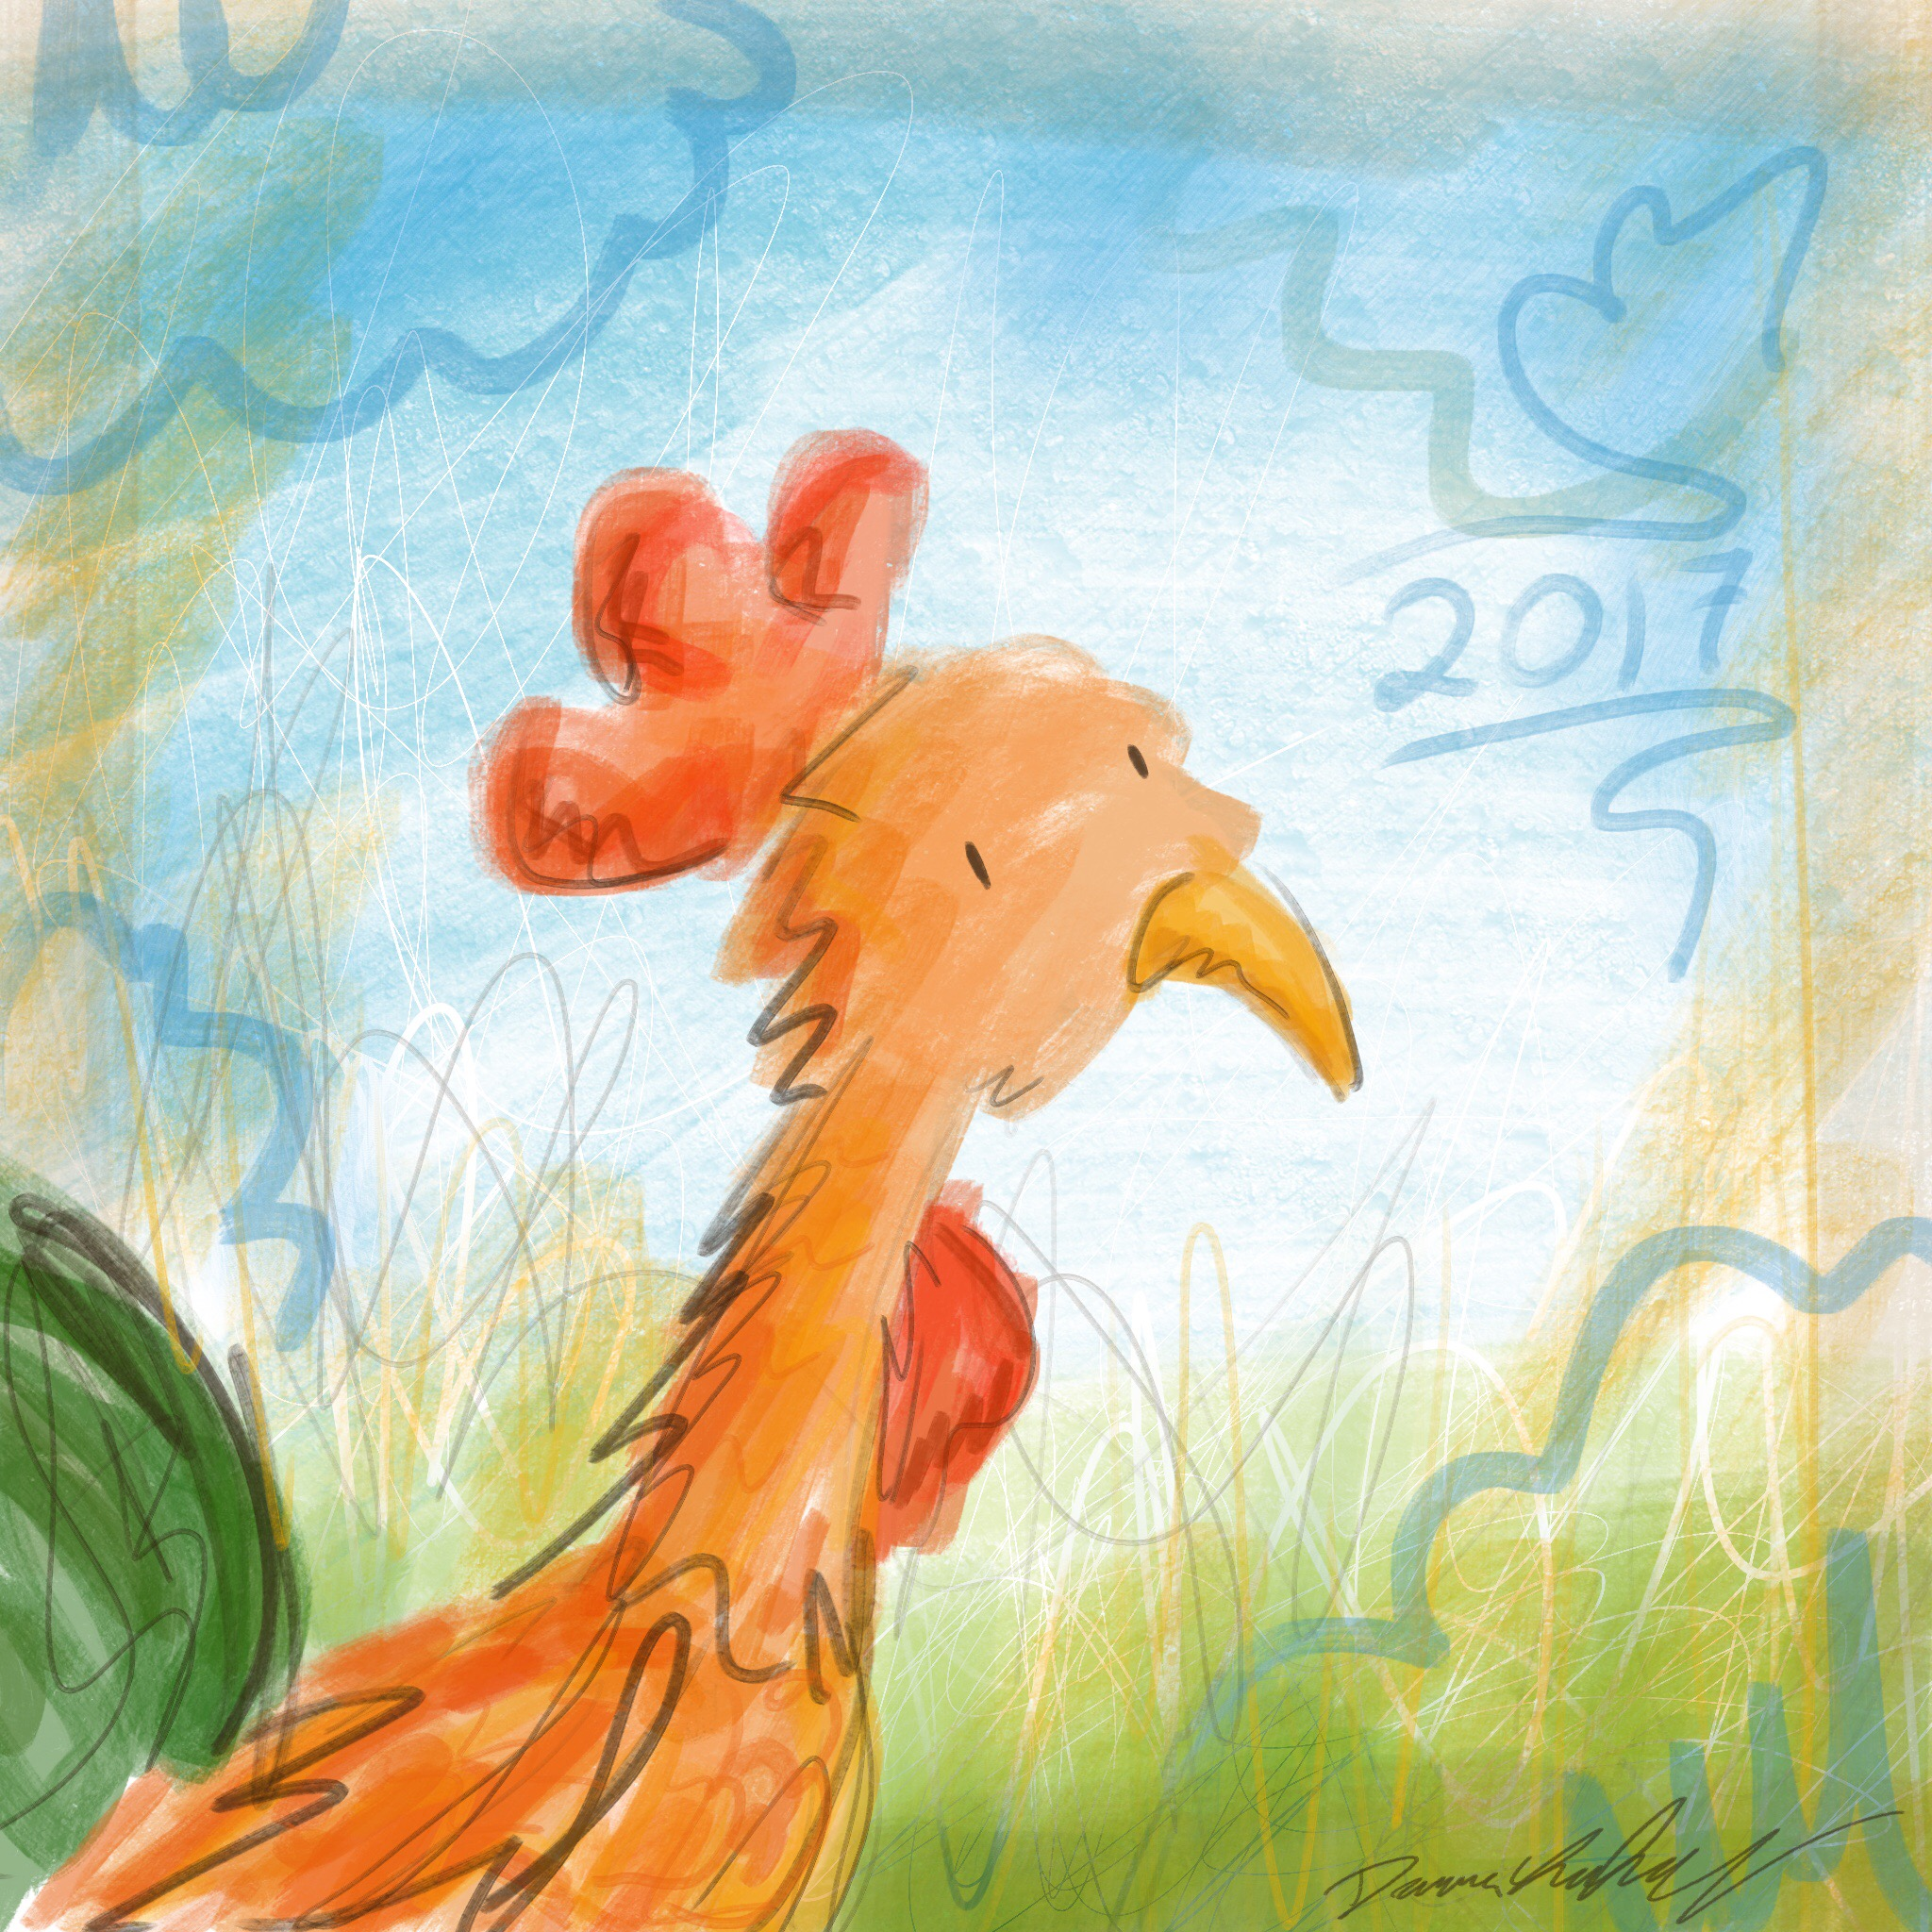 Week 2: Feathered Animal